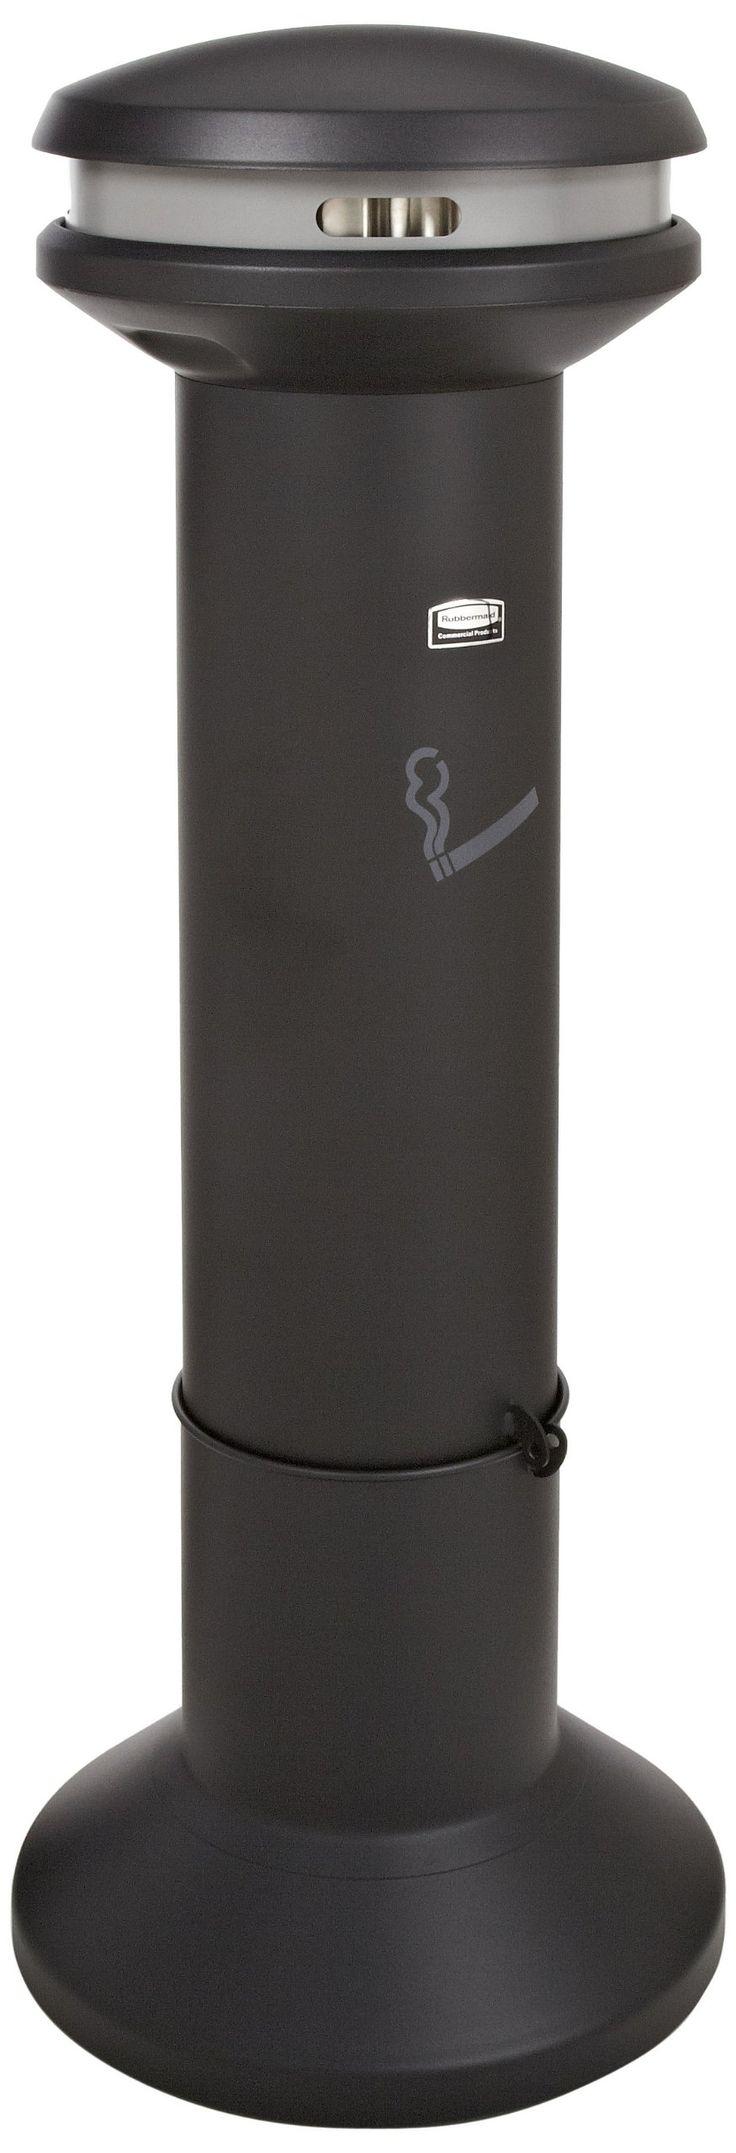 best 25 commercial smoker ideas on pinterest bbq equipment